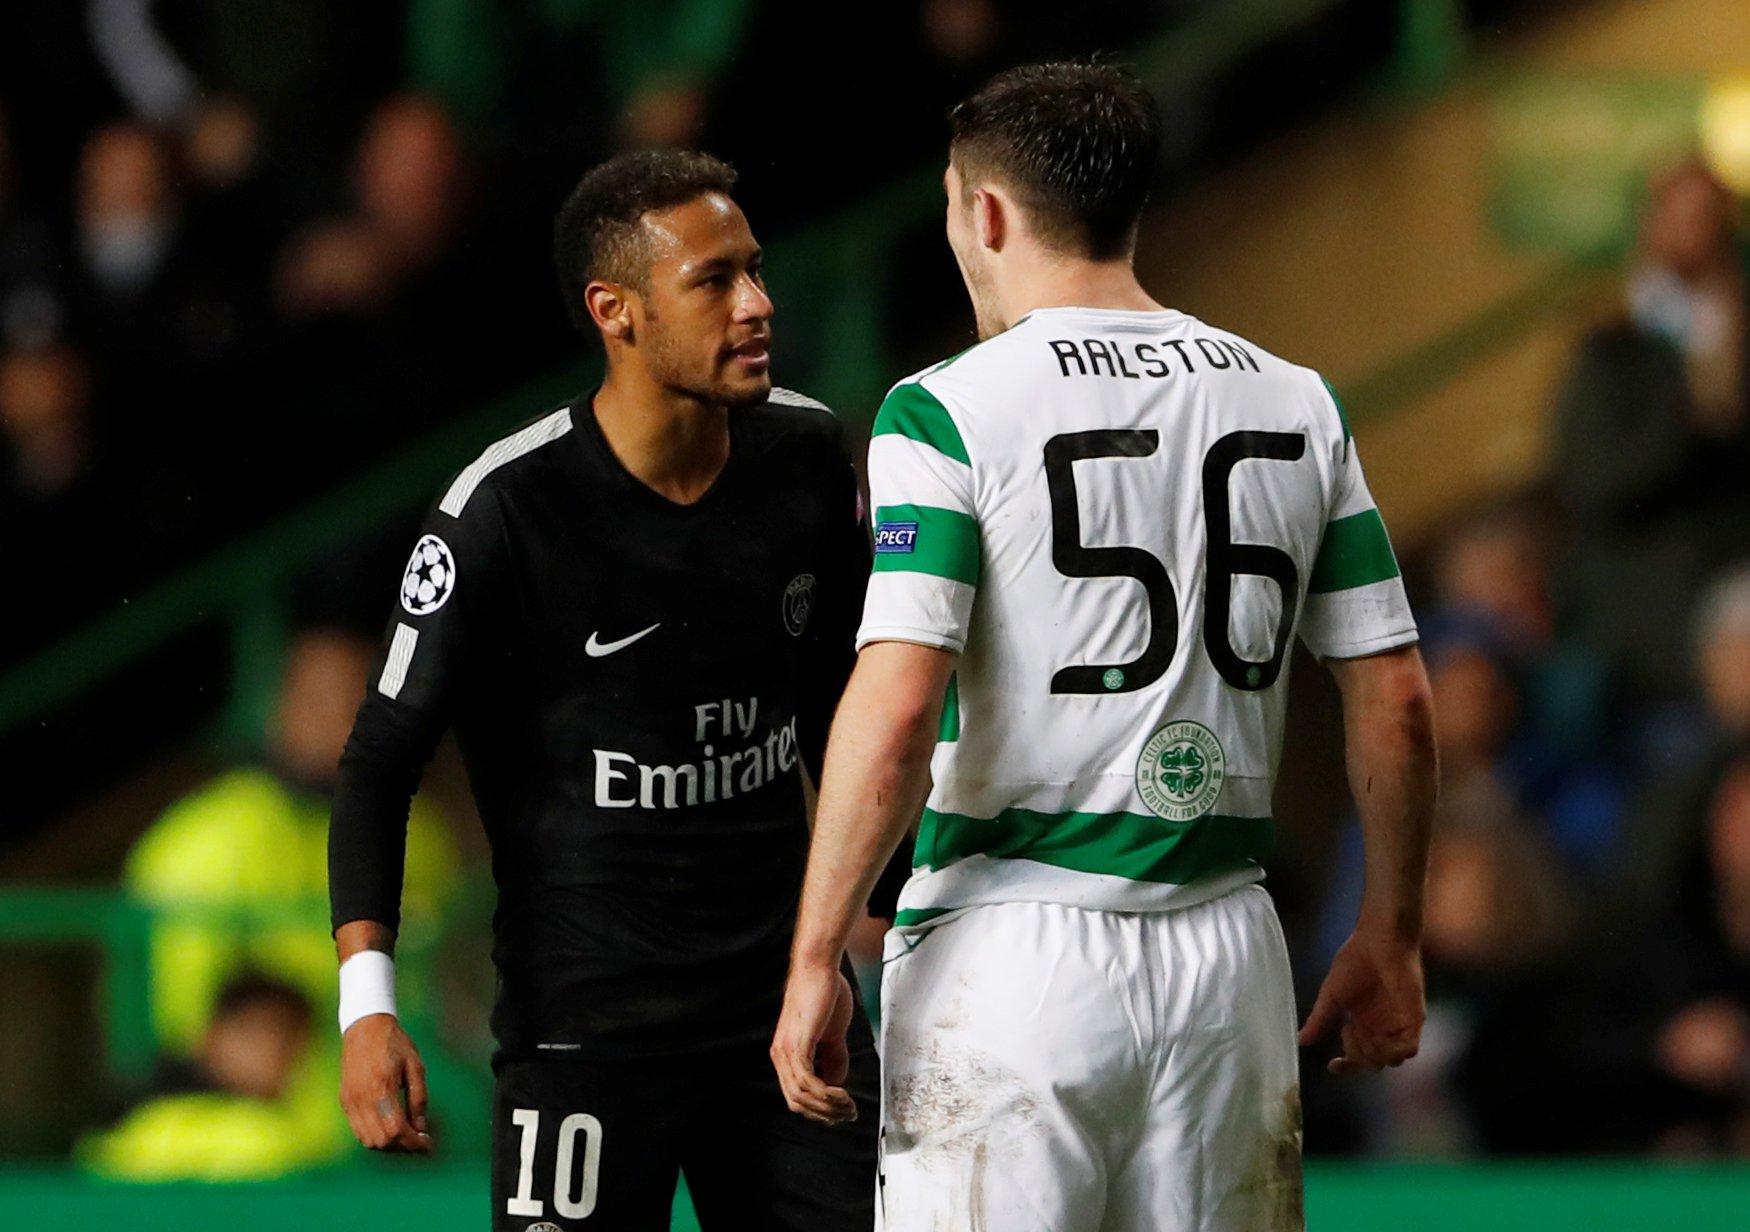 Neymar refuses to shake Anthony Ralston's hand after PSG hammer Celtic